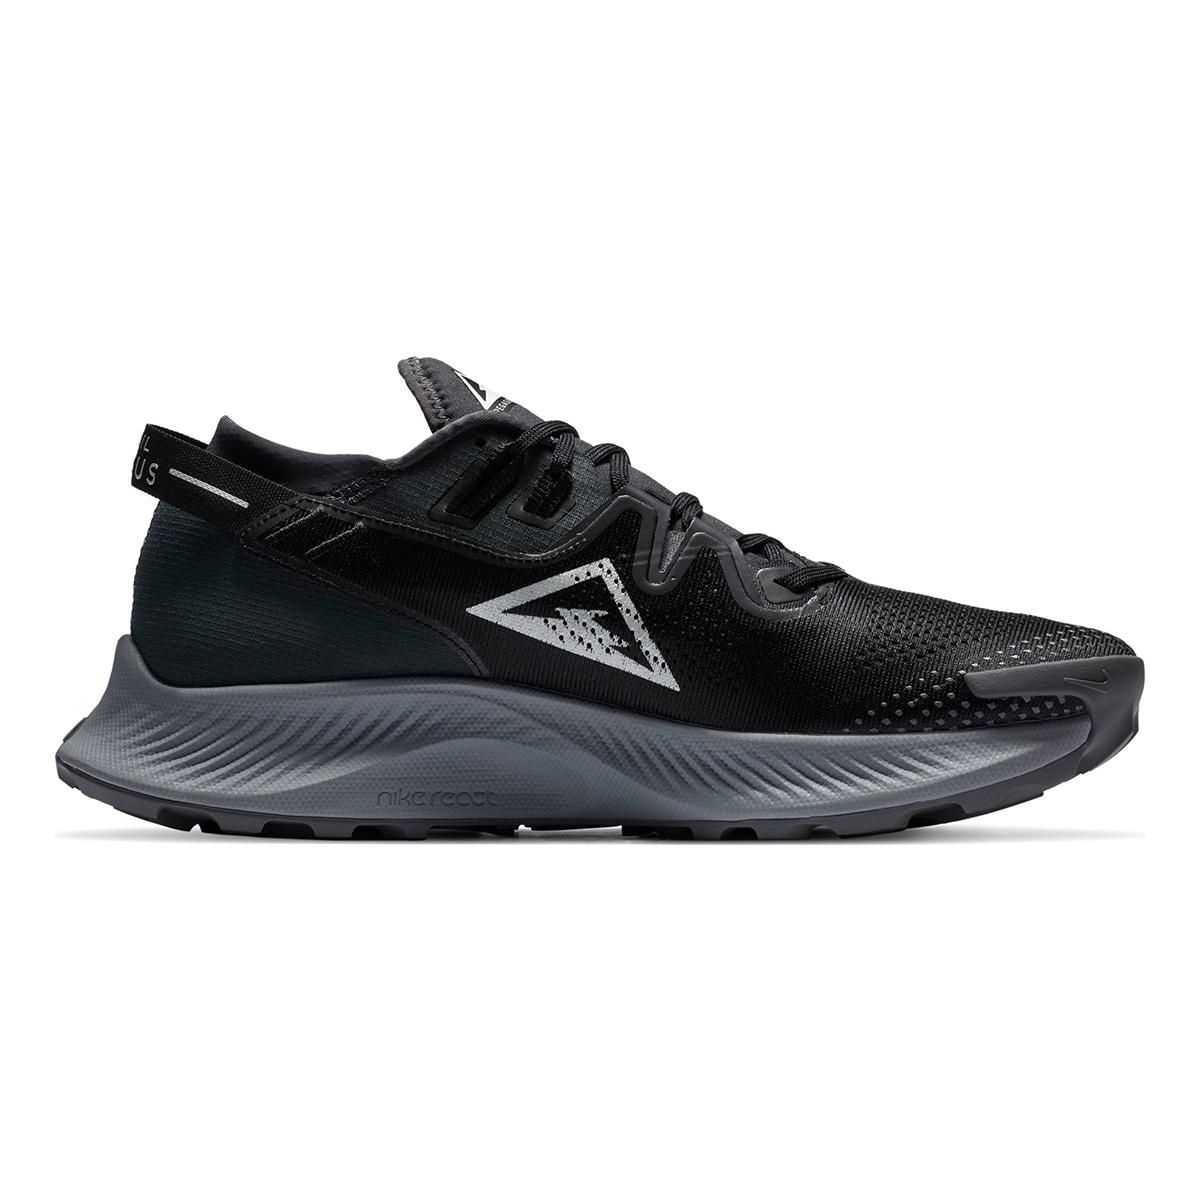 Men's Nike Pegasus Trail 2 Trail Running Shoe - Color: Black/Dark Smoke Grey/Particle Grey/Spruce Aura - Size: 6 - Width: Regular, Black/Dark Smoke Grey/Particle Grey/Spruce Aura, large, image 2